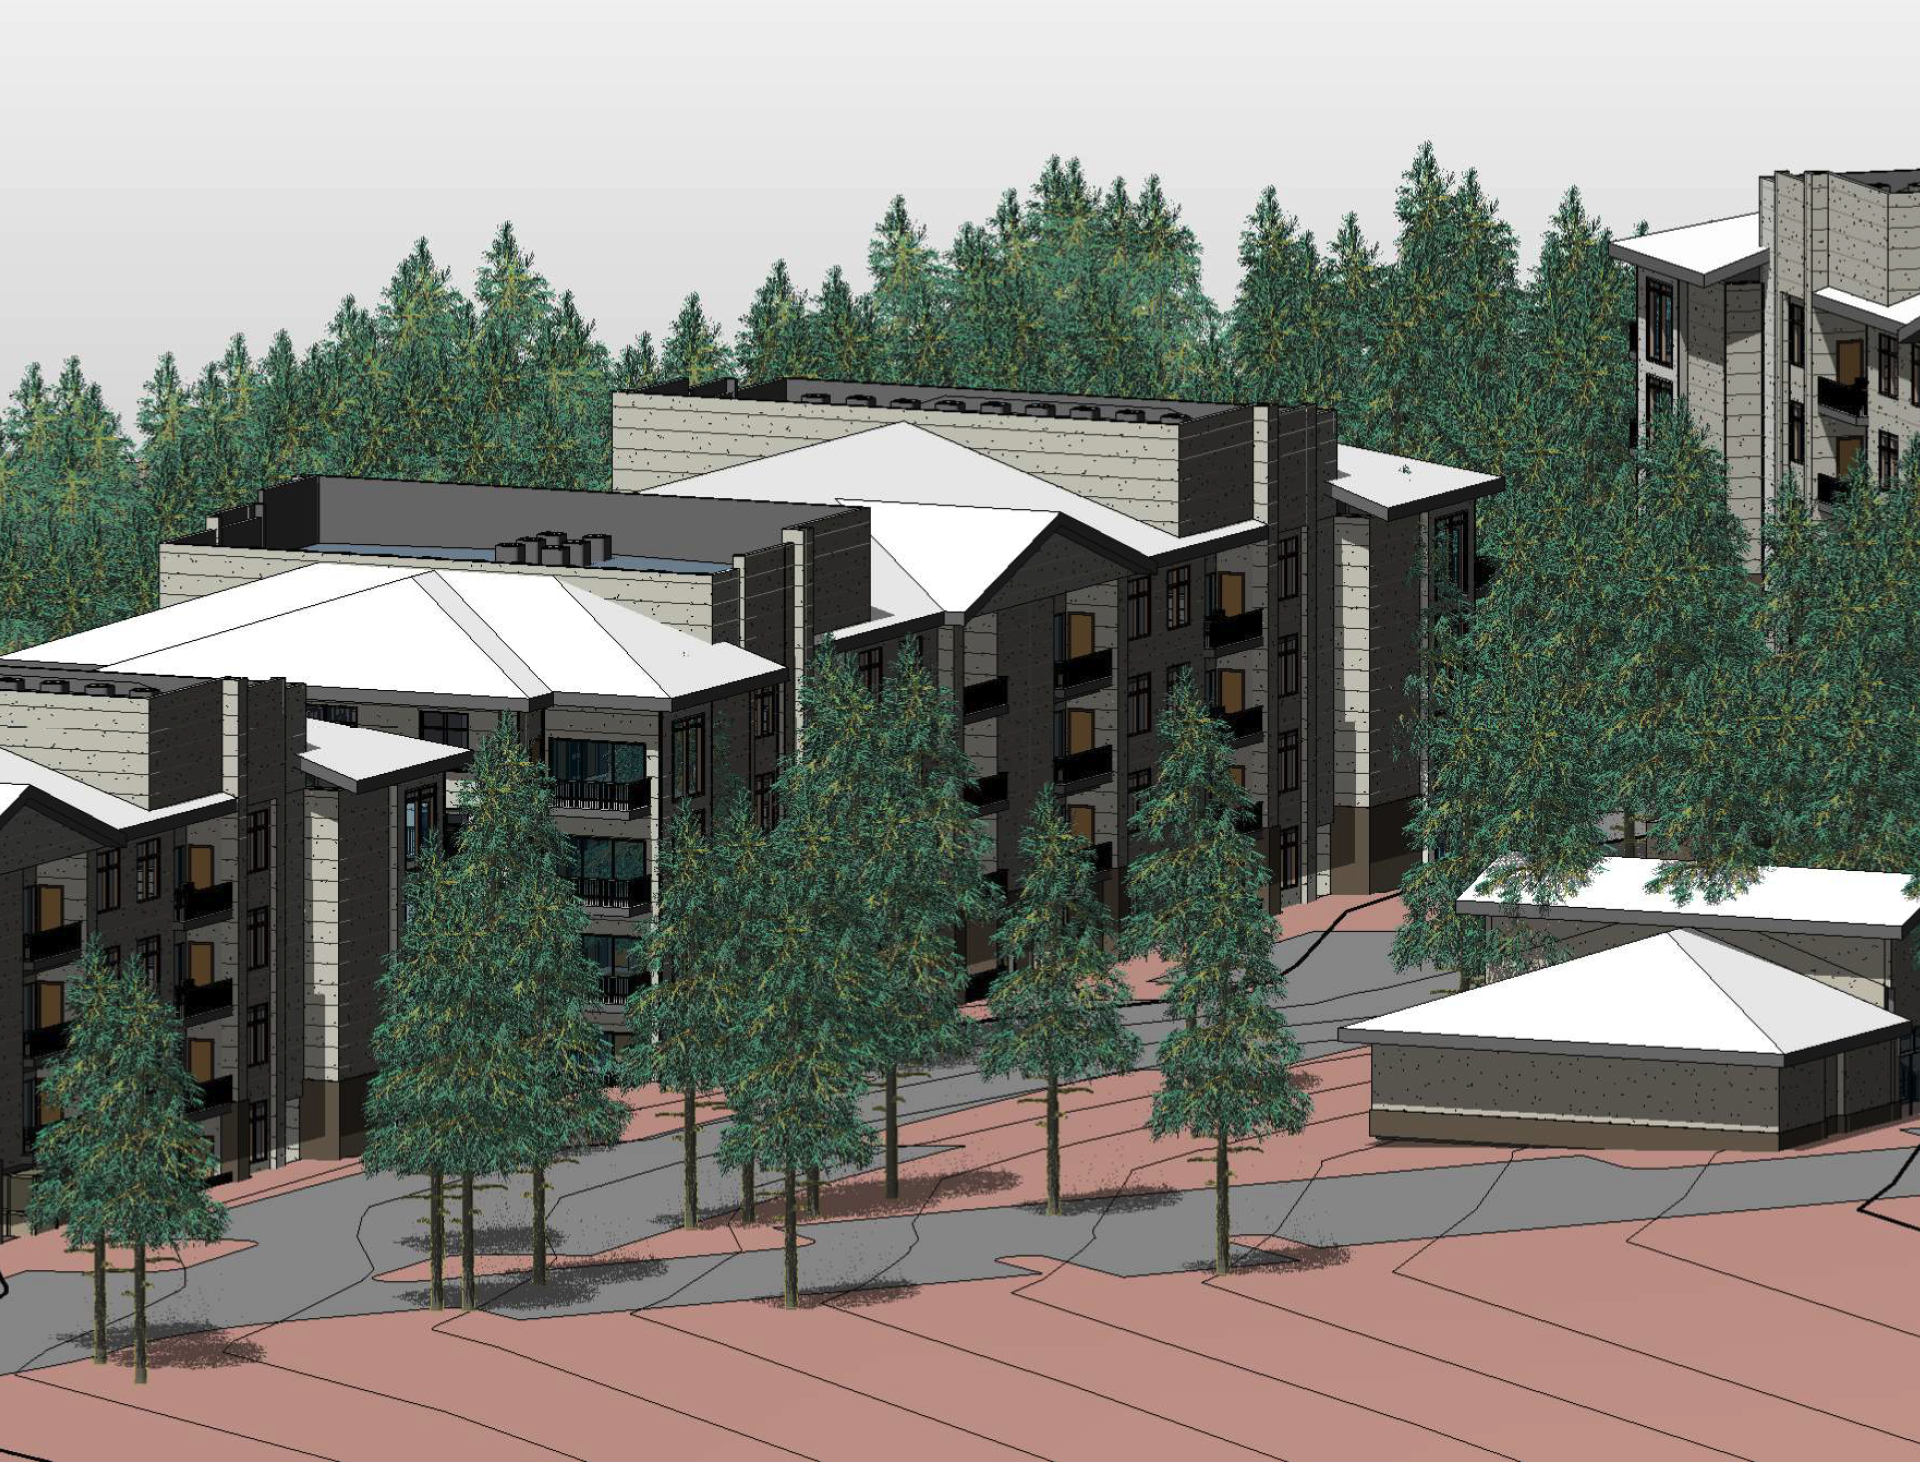 The Elkwood Apartments Rendering